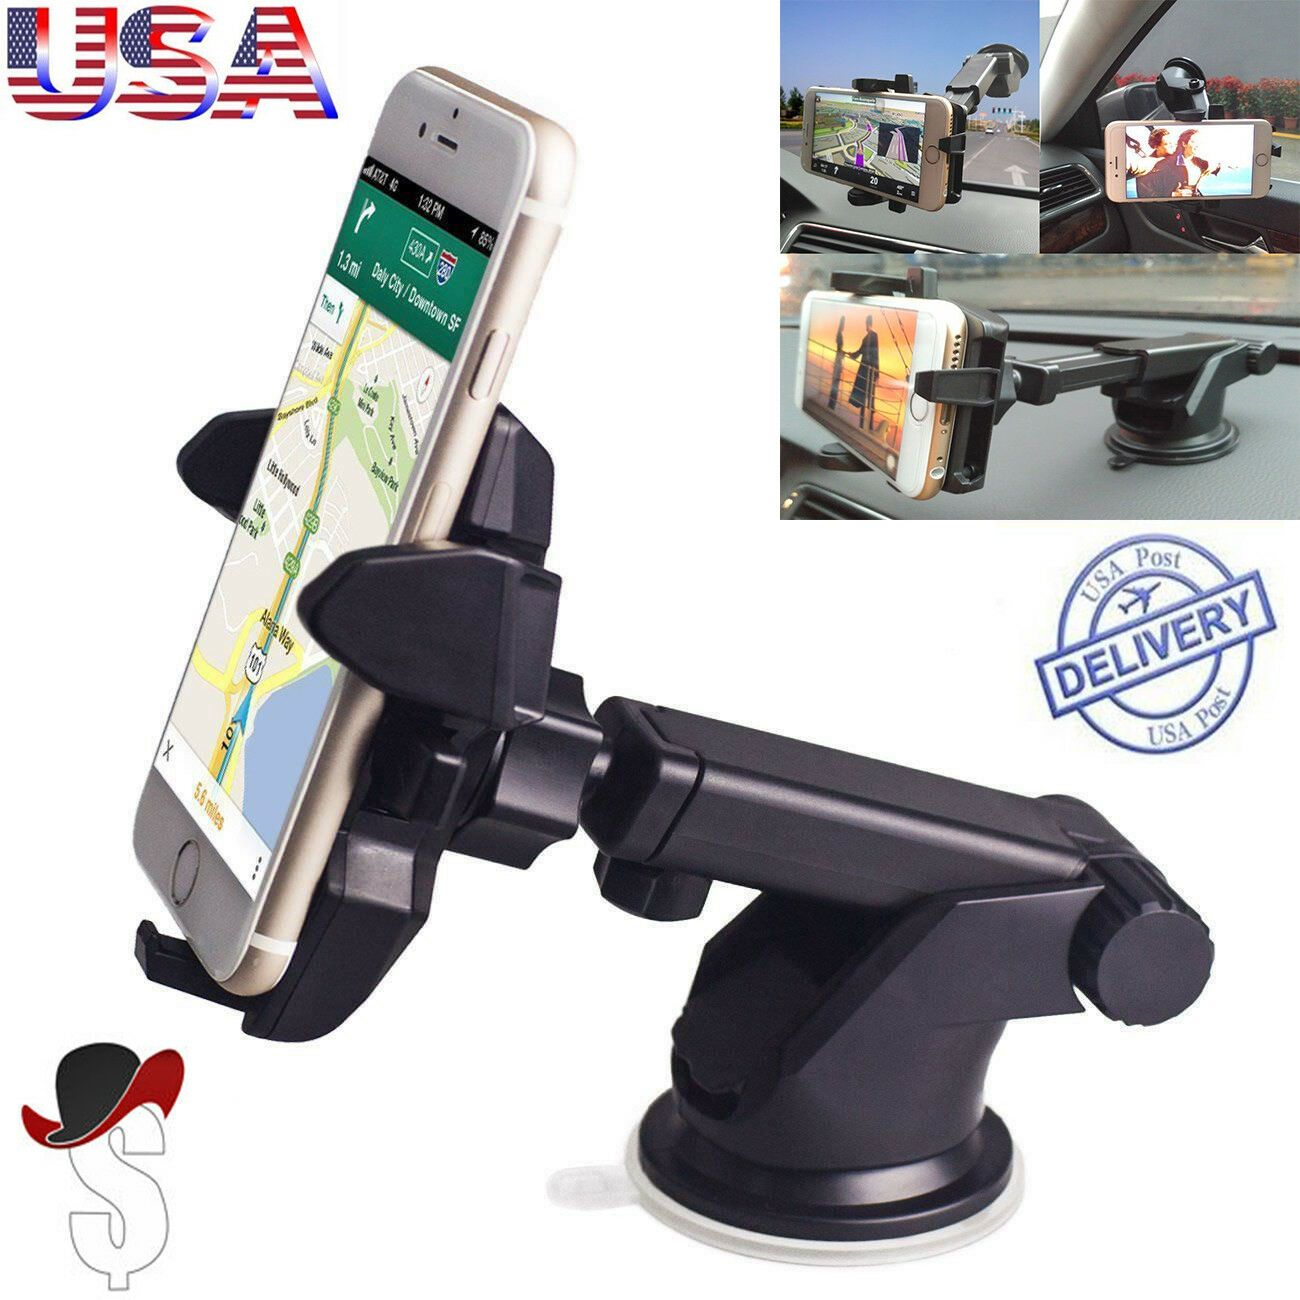 Pin On Car Phone Holder